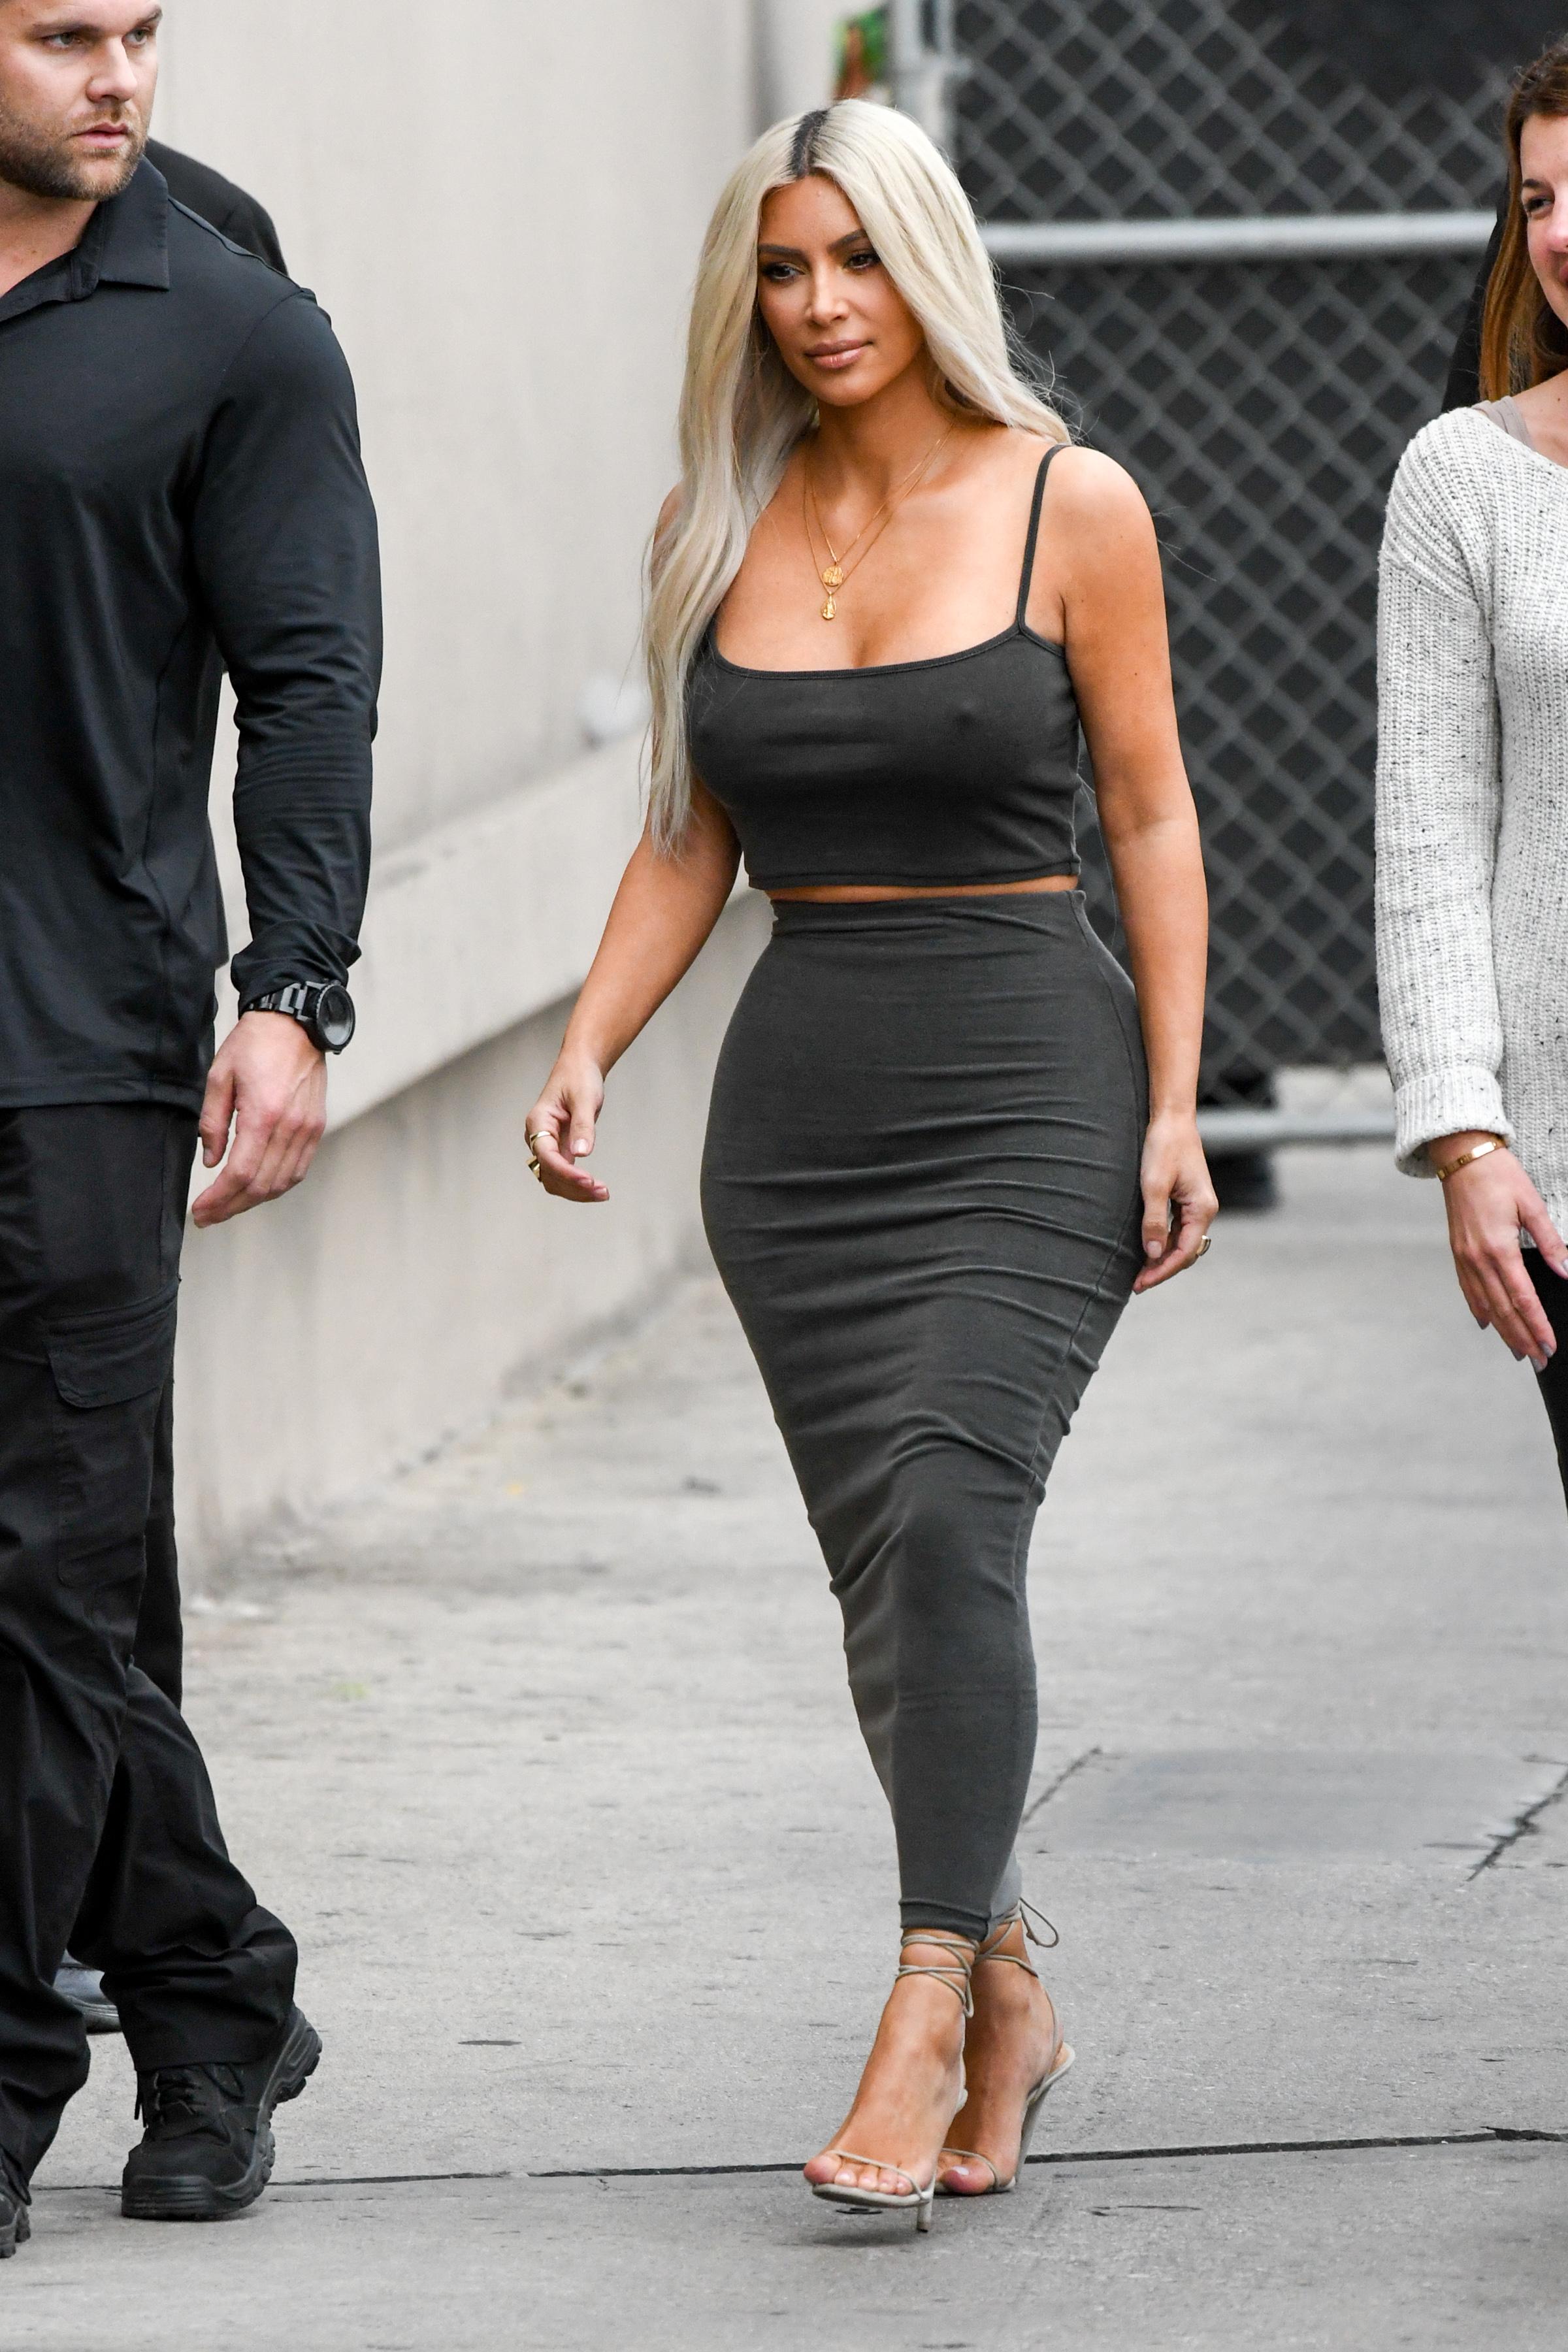 Kim kardashian, pezones, braless